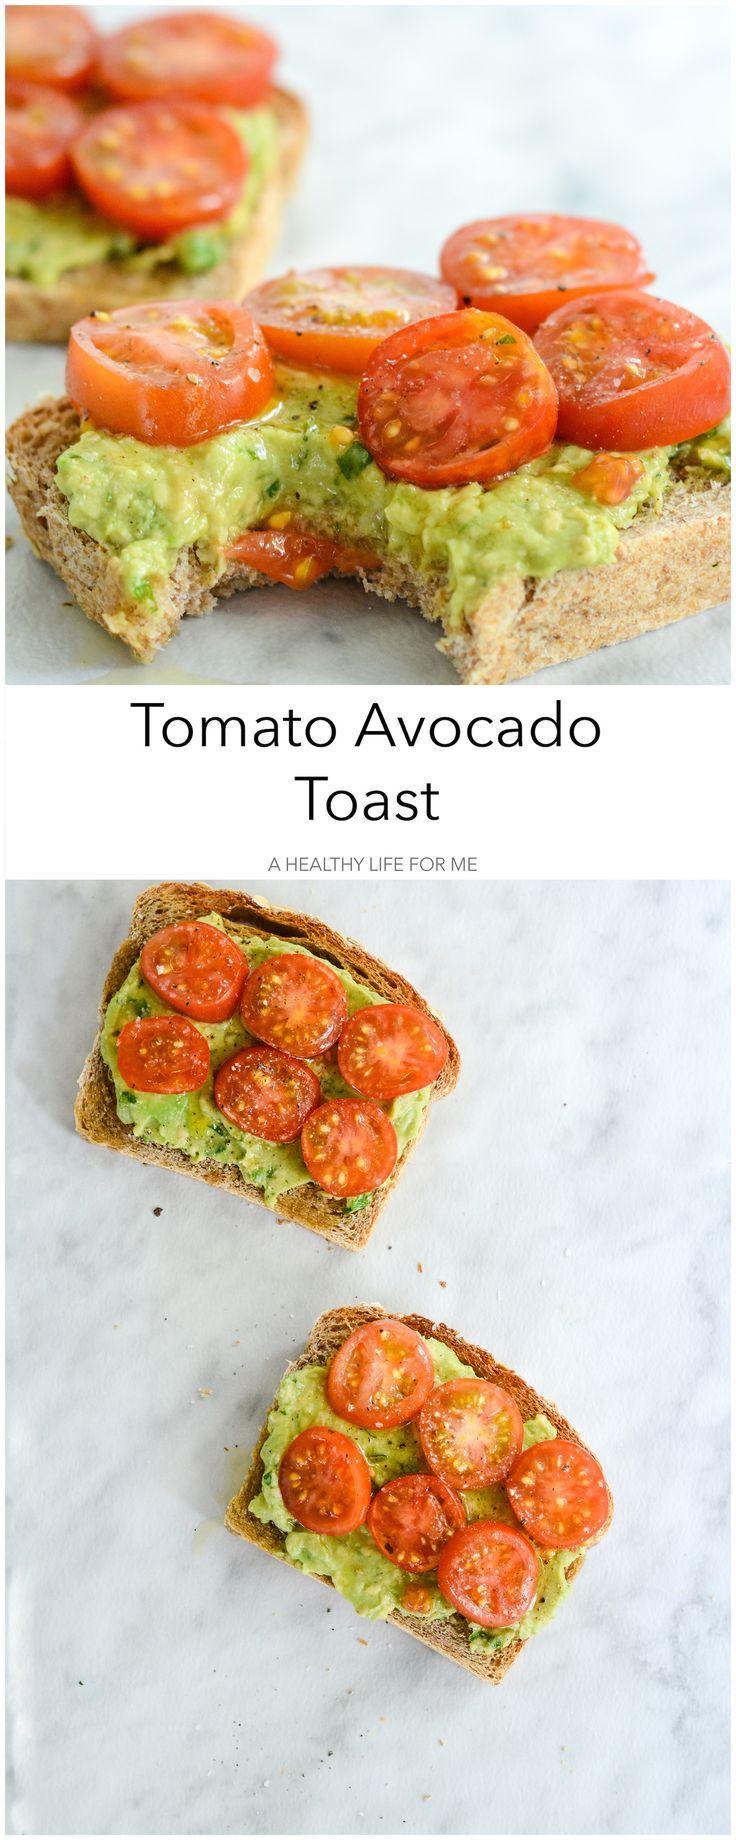 Tomato Avocado Toast - A Healthy Life For Me